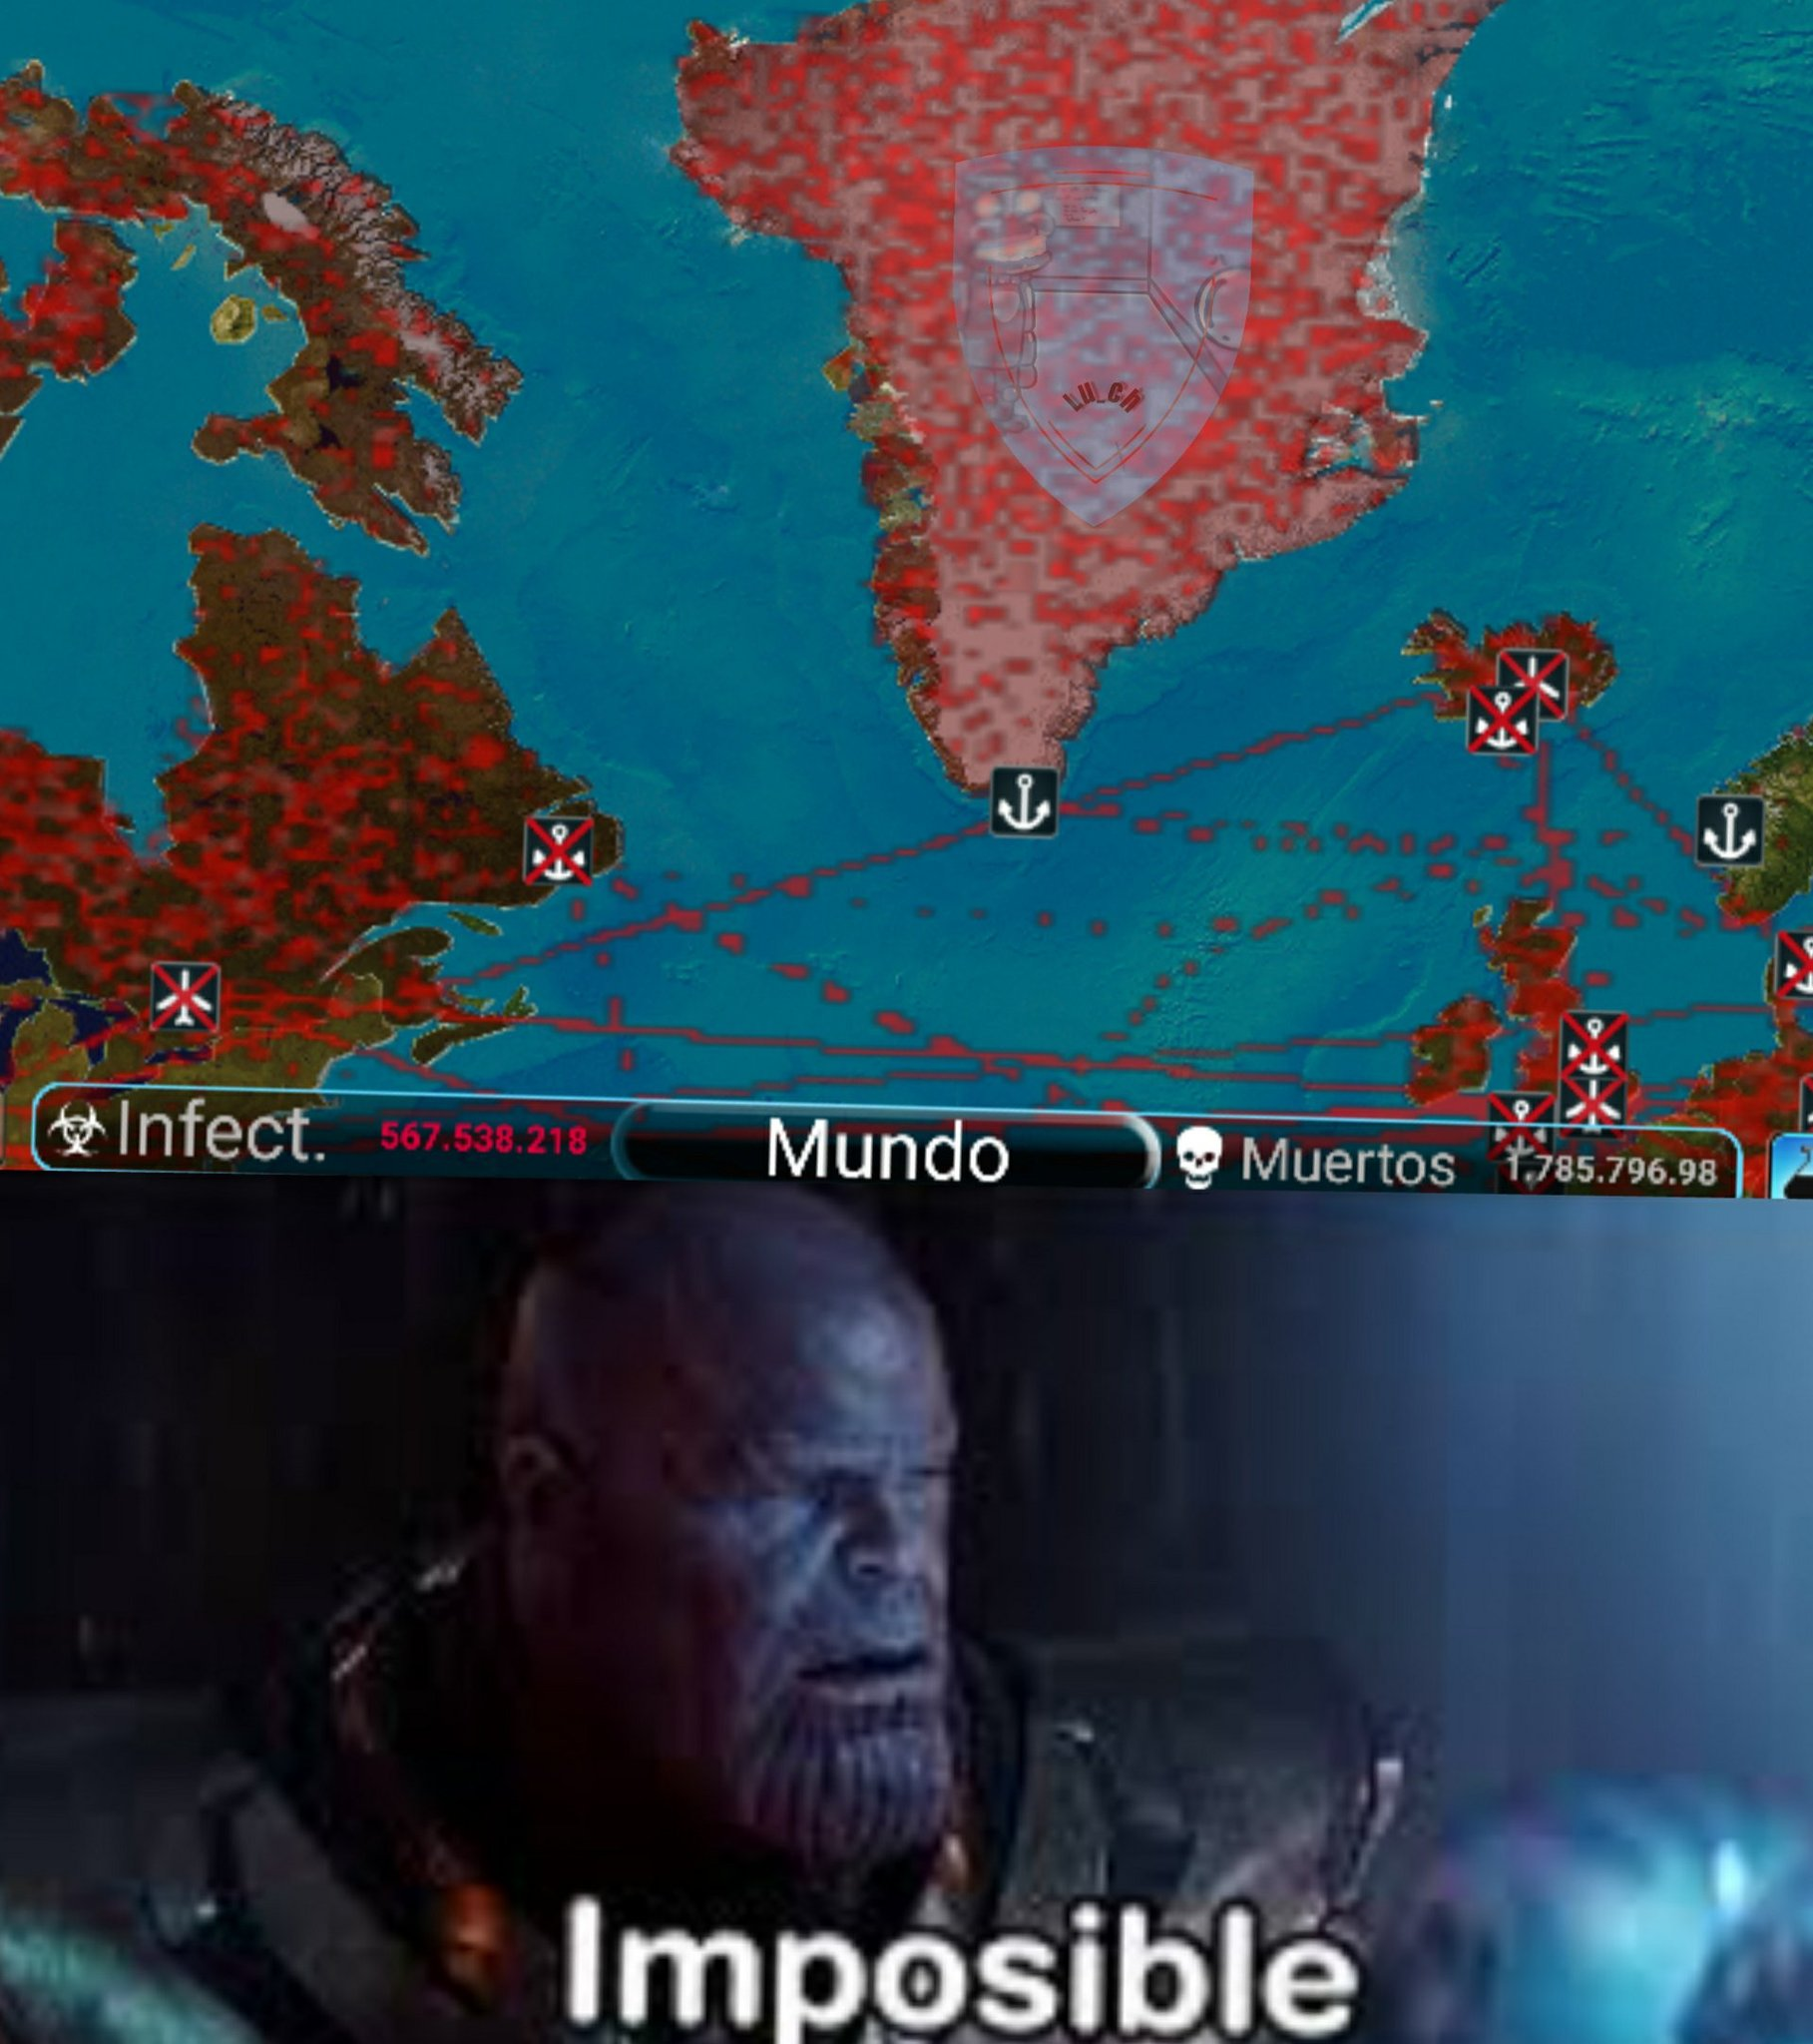 Si es imposible infectar a Groenlandia - meme